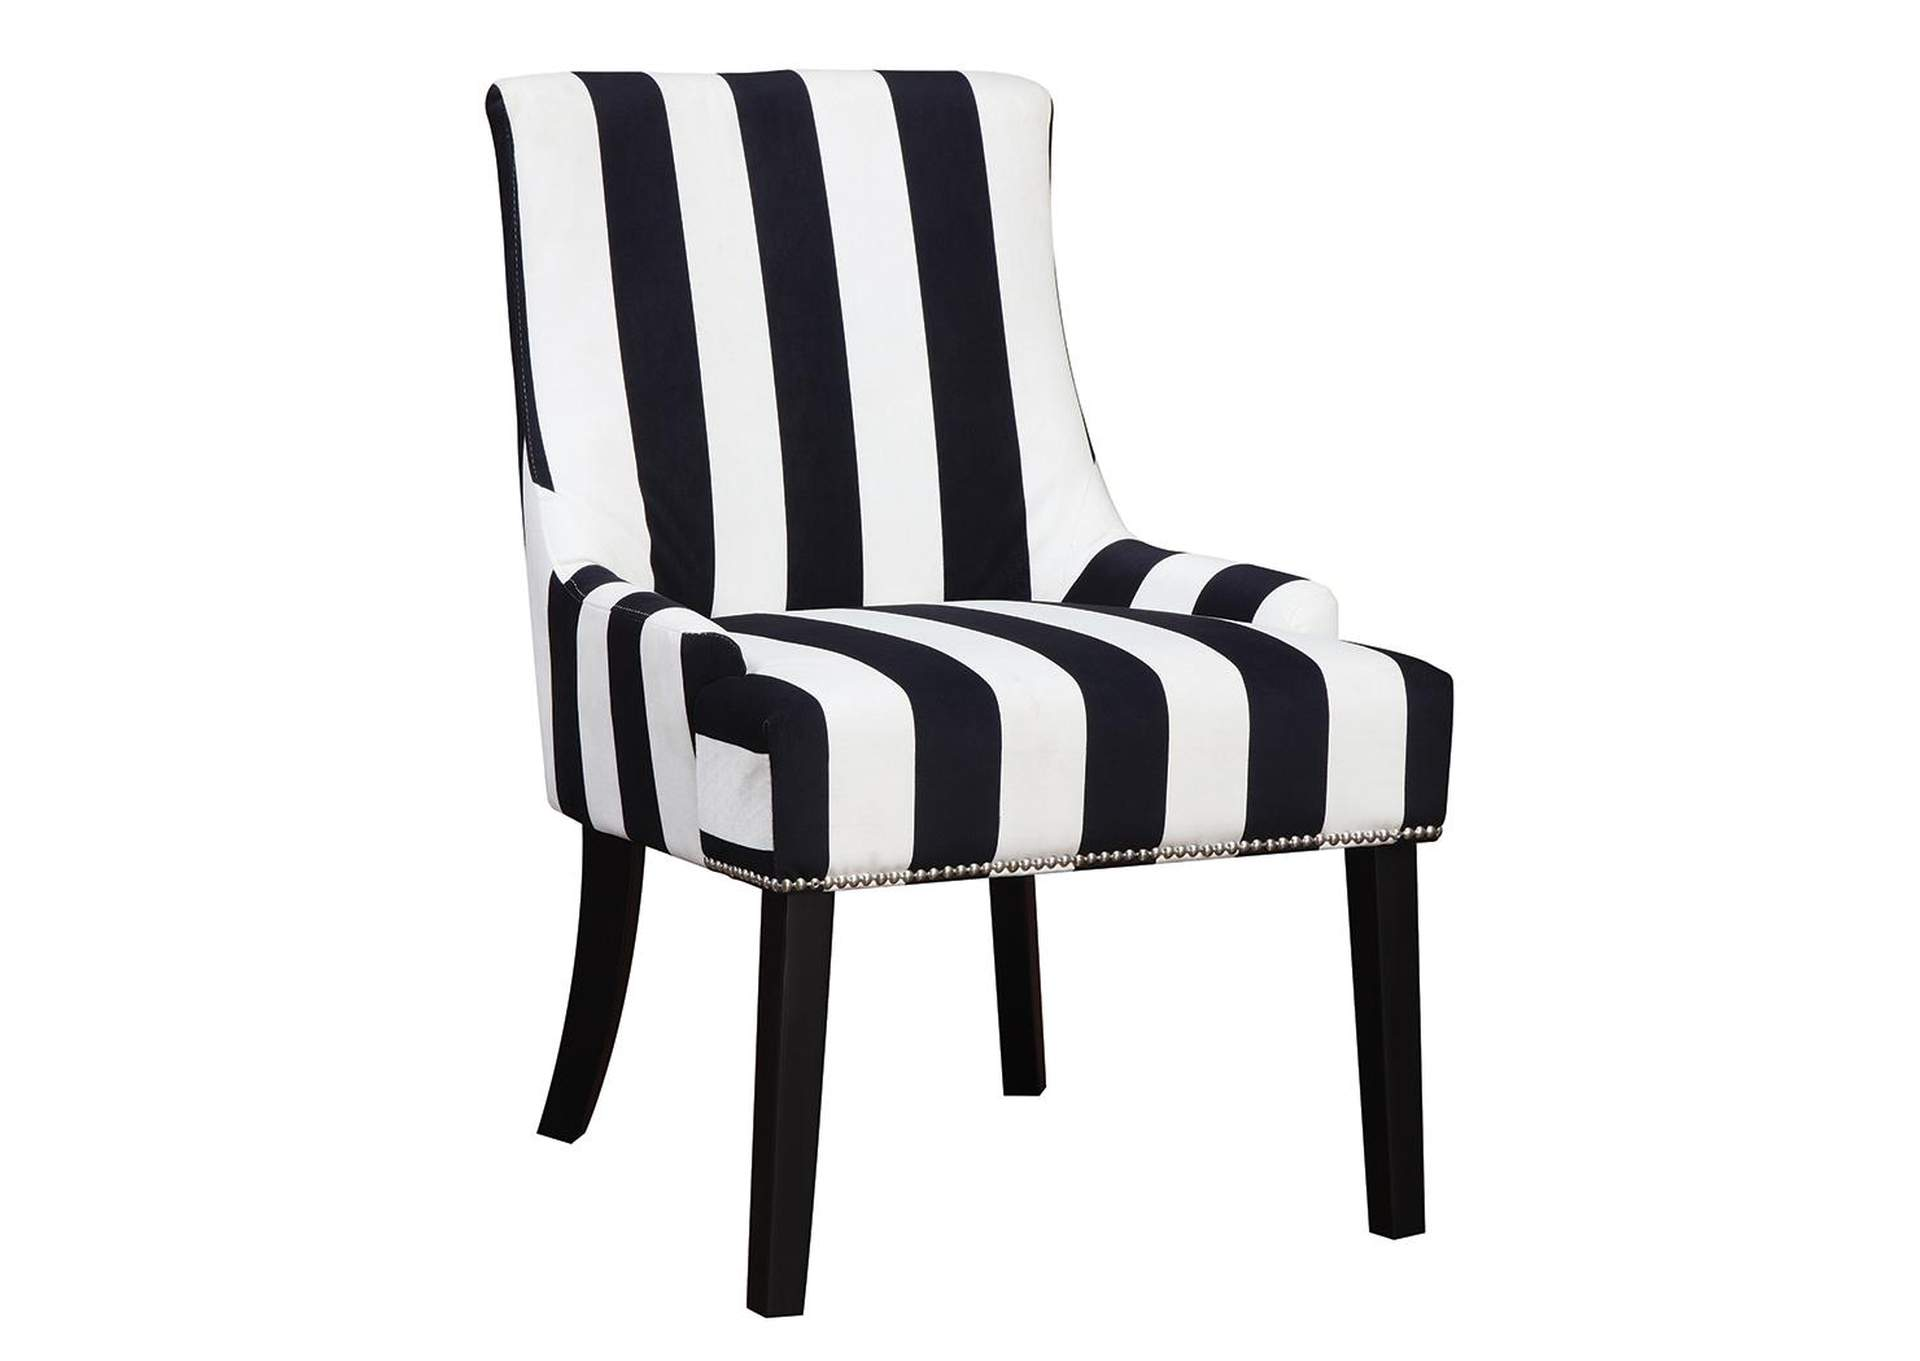 Tremendous Design Center Orange Ca Black Accent Chair Pdpeps Interior Chair Design Pdpepsorg